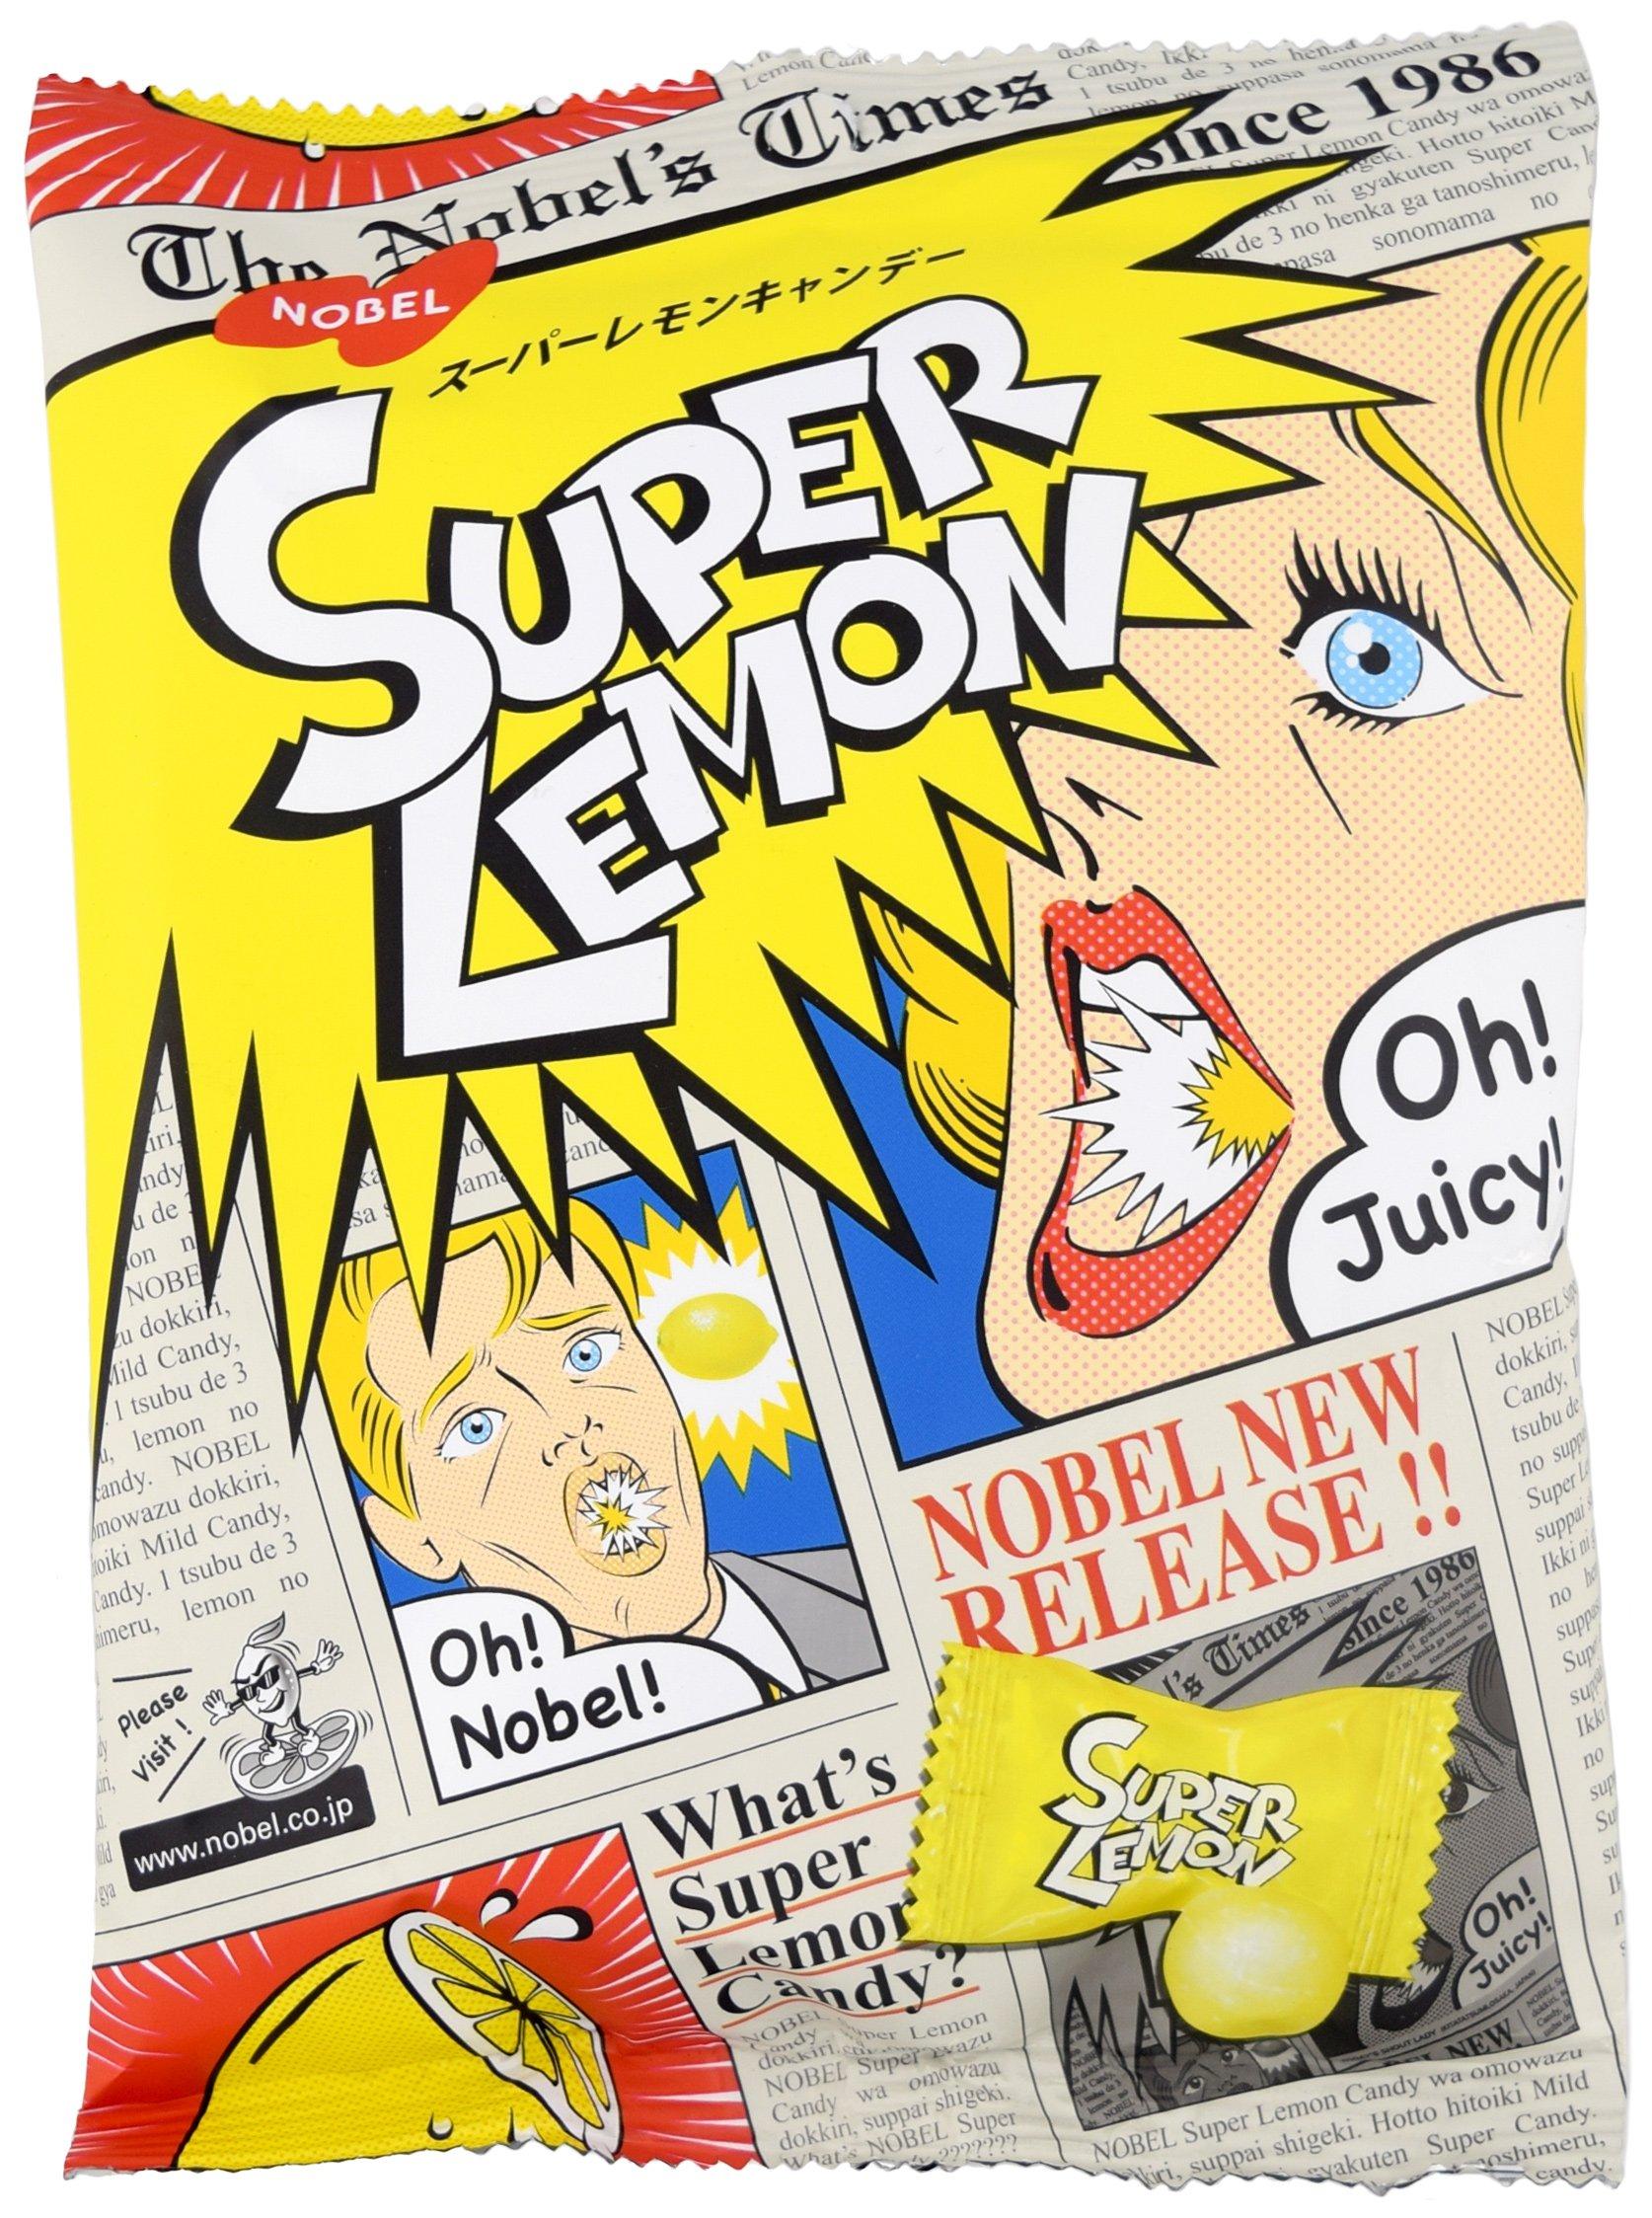 Nobel Japanese Candy, Nostalgic Super Lemon Candy, 3.09-Ounce Bags (Pack of 6) by Nobel®